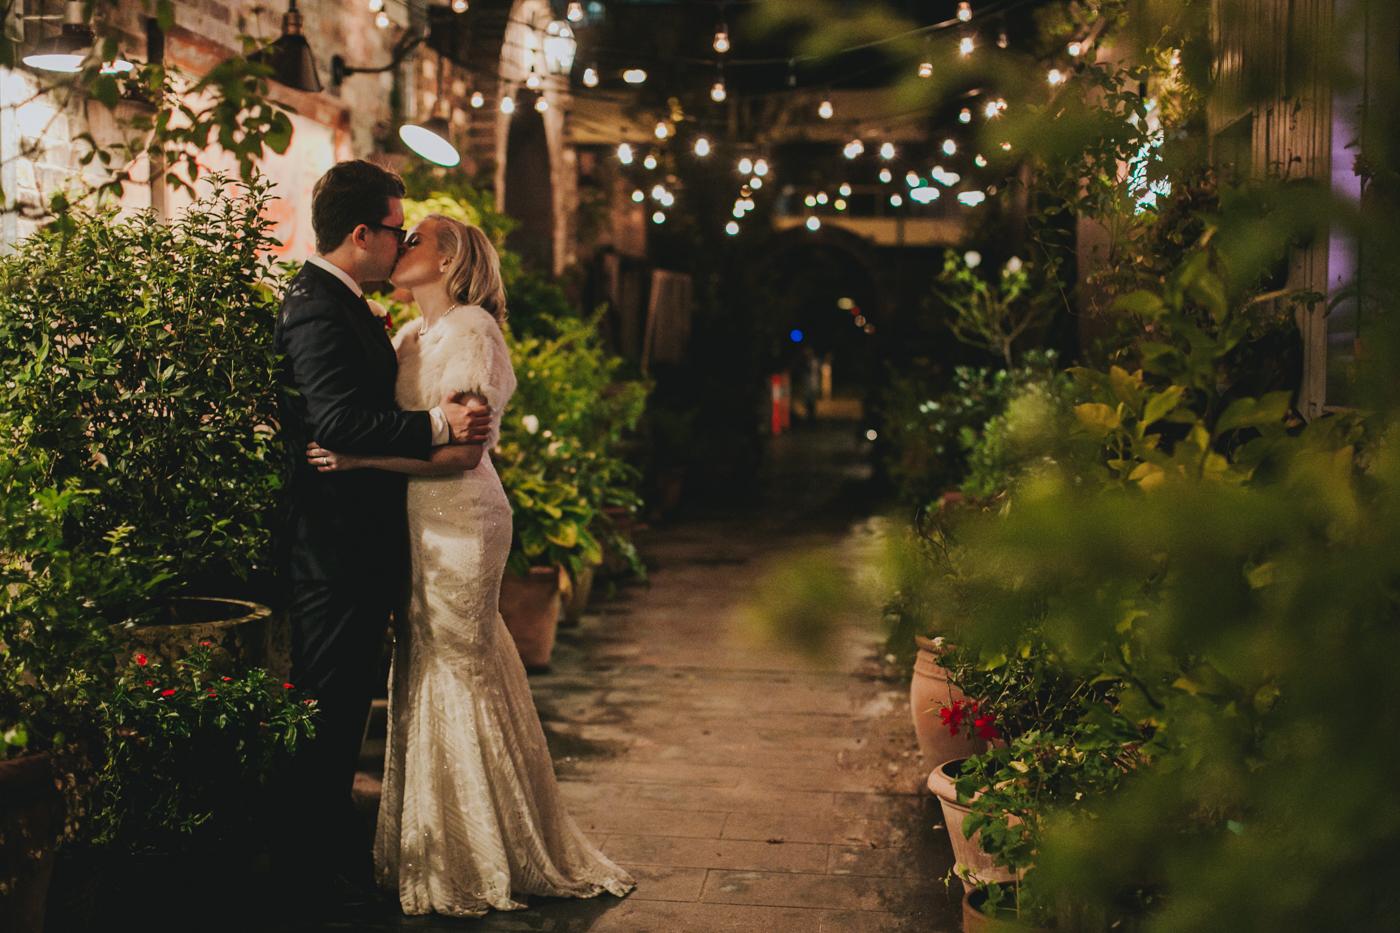 Jo & Tom Wedding - The Grounds of Alexandria - Samantha Heather Photography-335.jpg